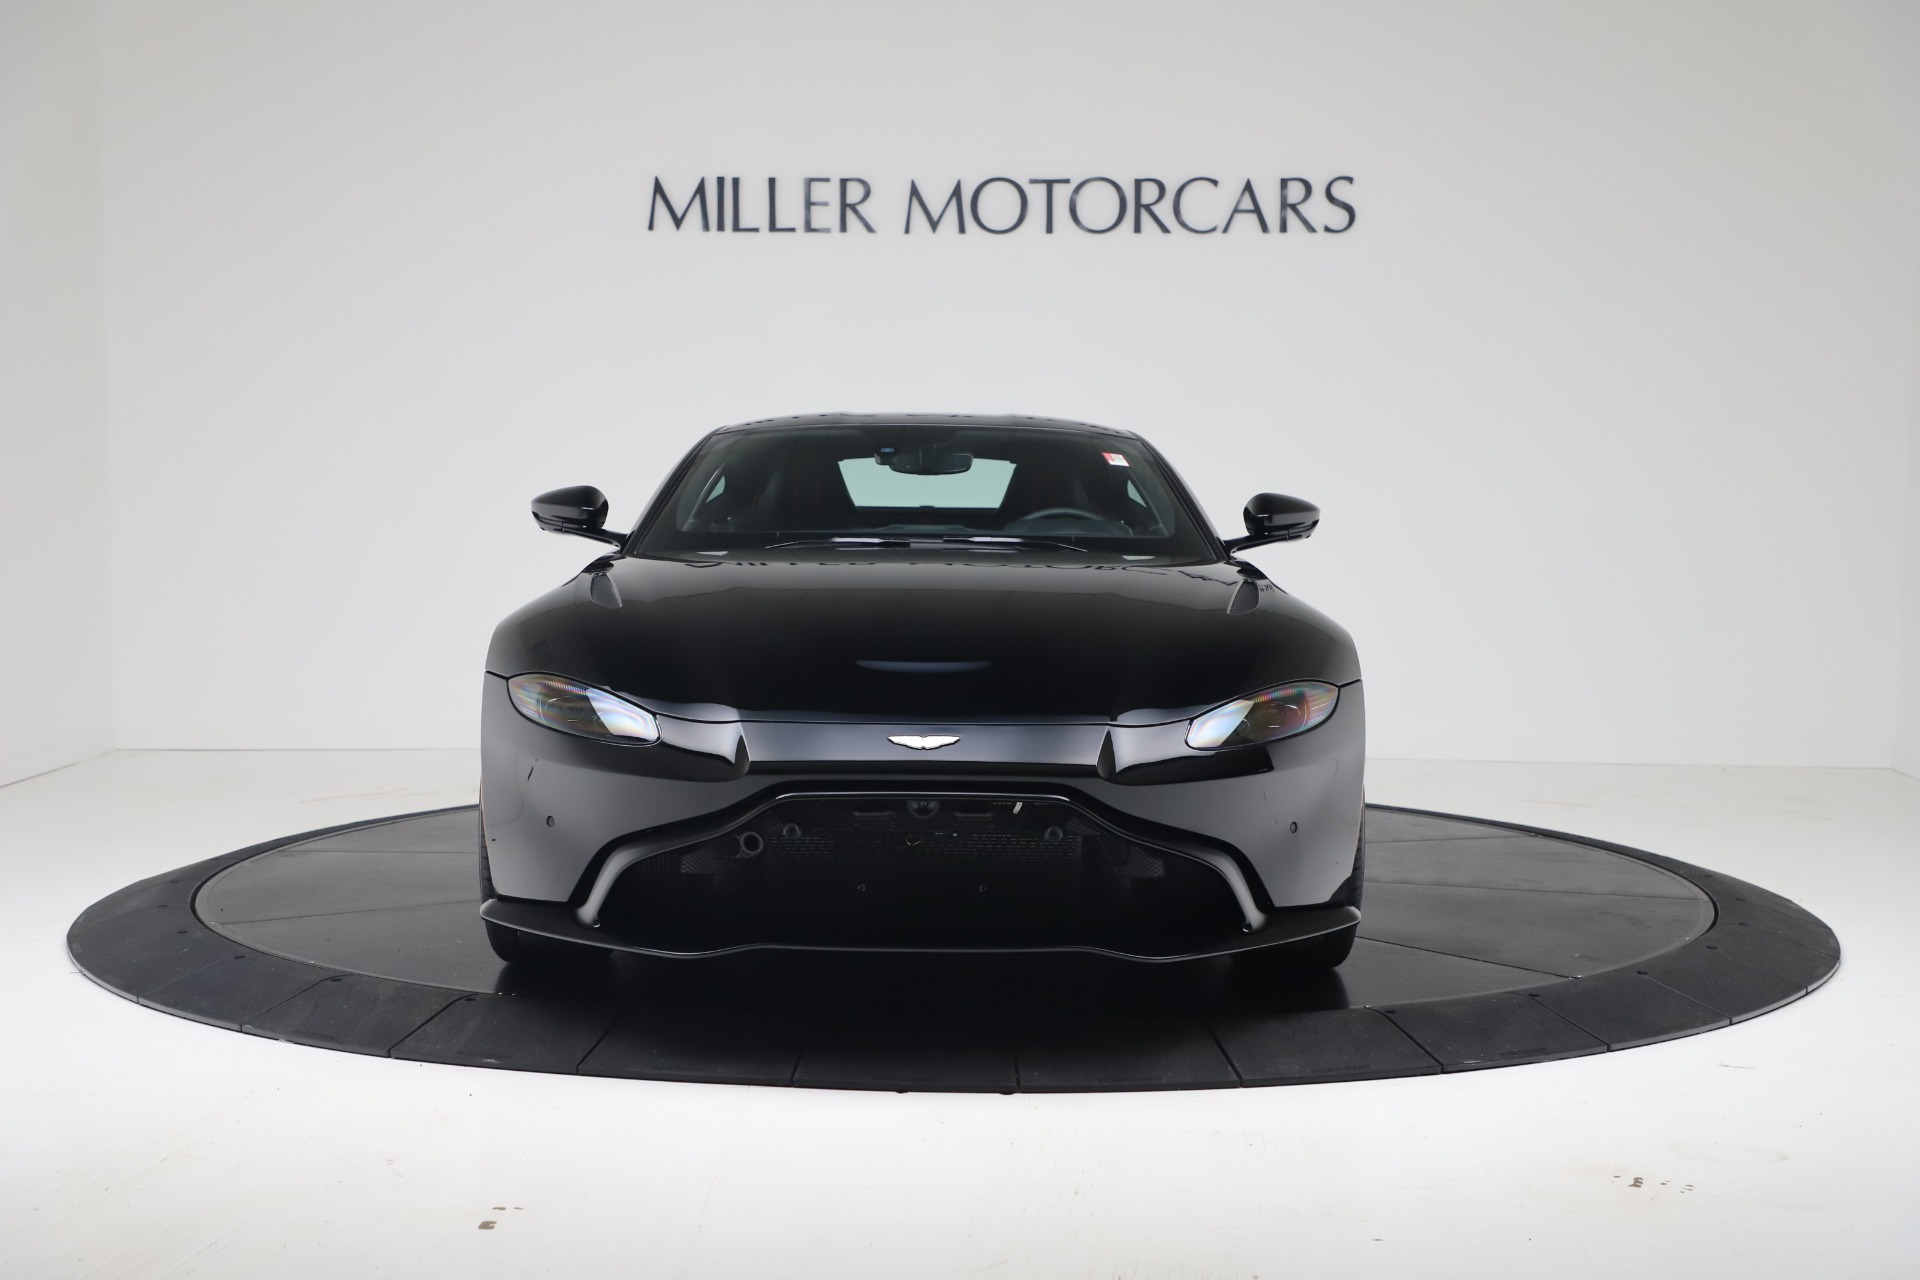 New 2020 Aston Martin Vantage V8 For Sale In Westport, CT 3547_p3